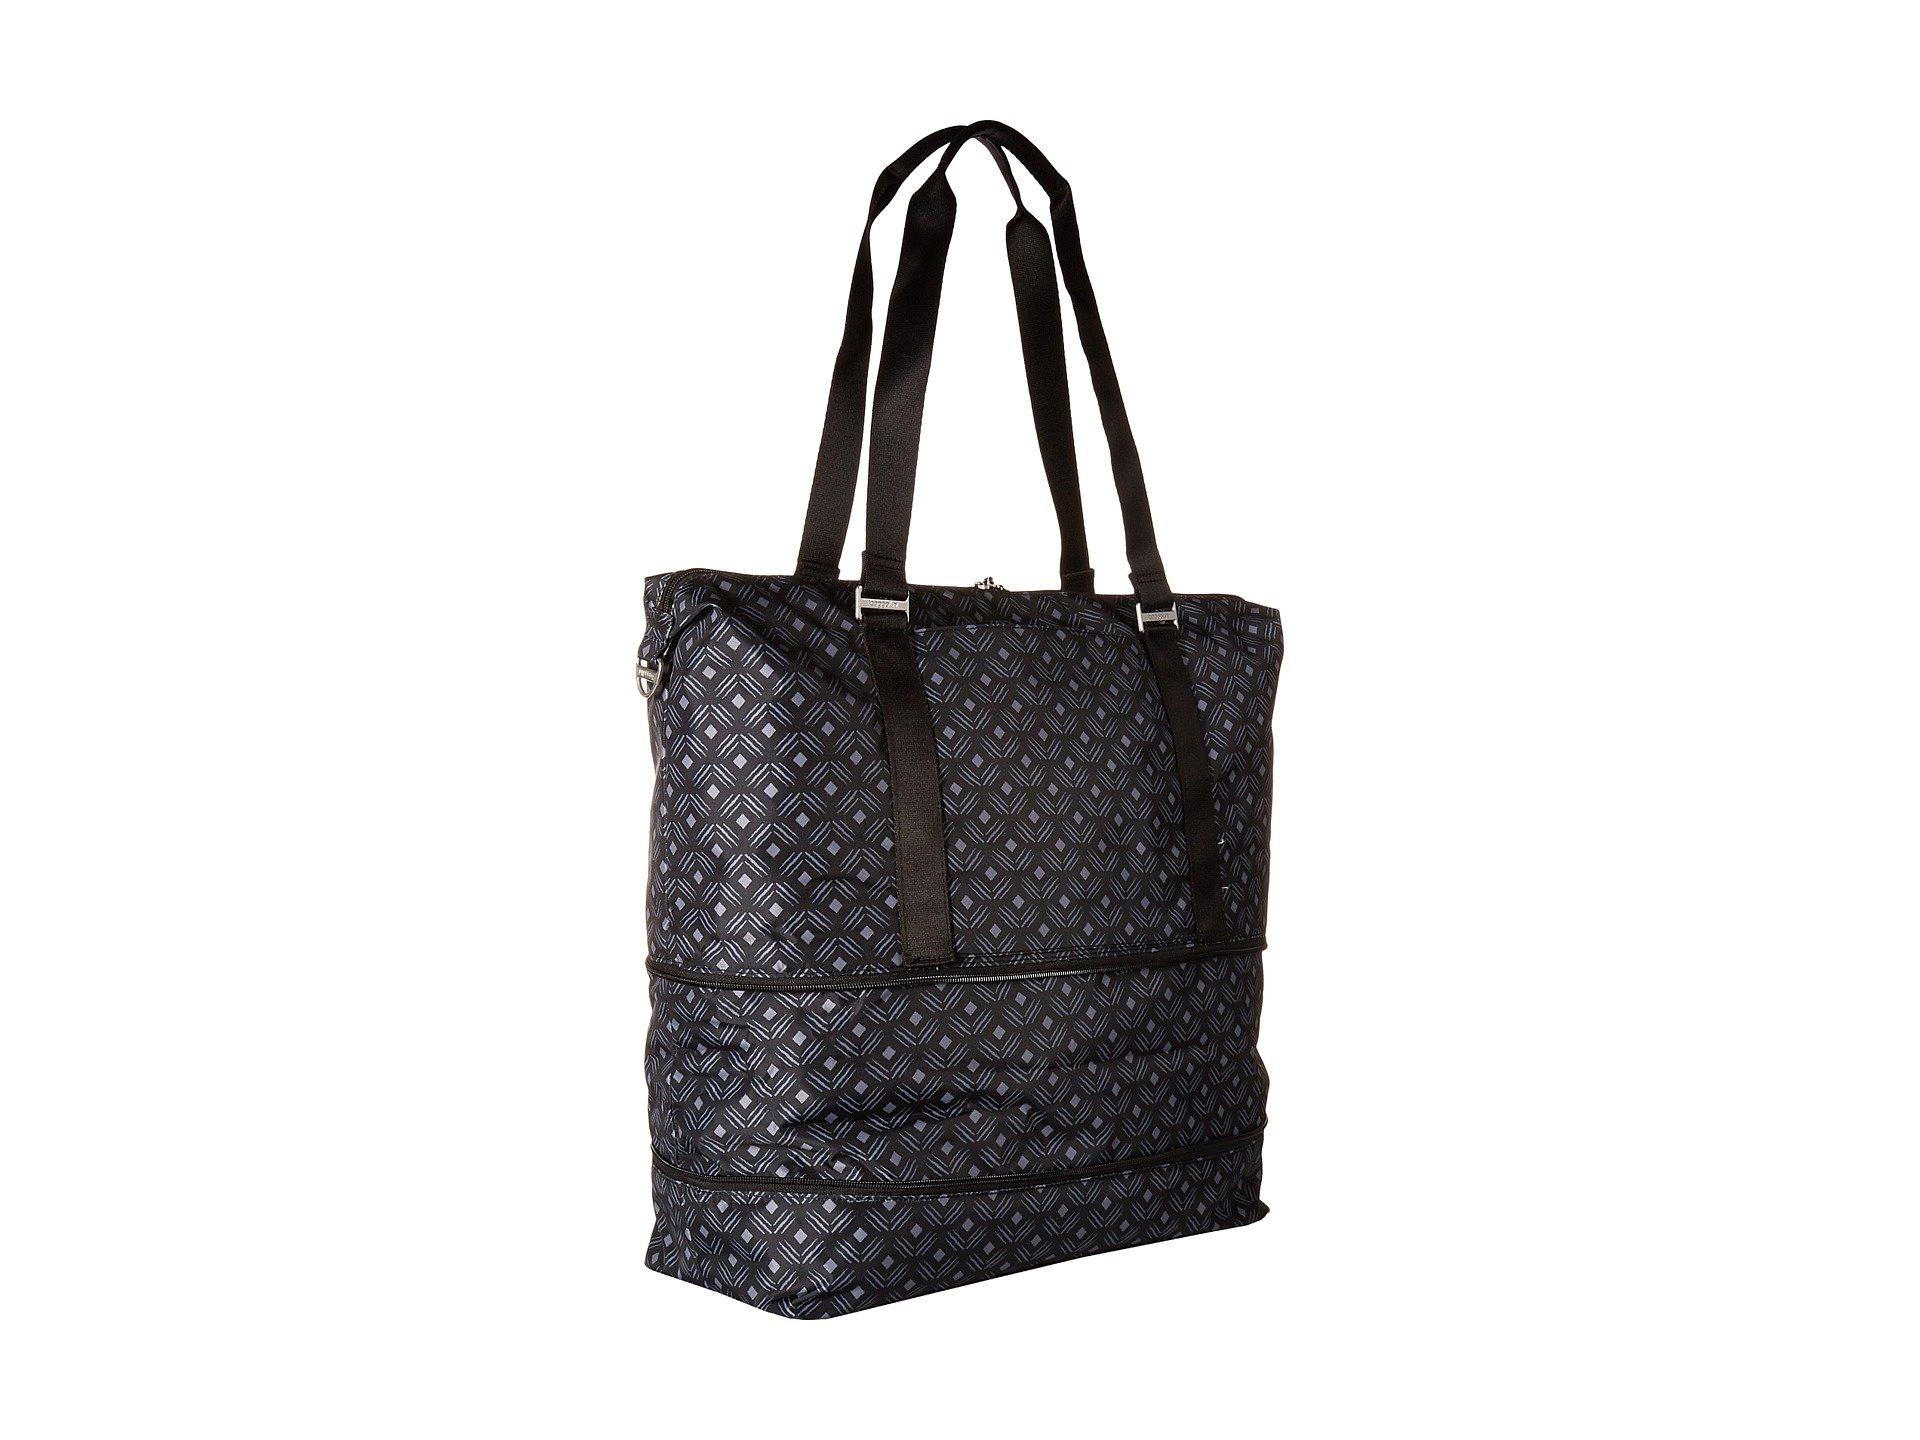 Expandable On Duffel Print Diamond Baggallini Multi Black Carry pAqZ4w4nPx